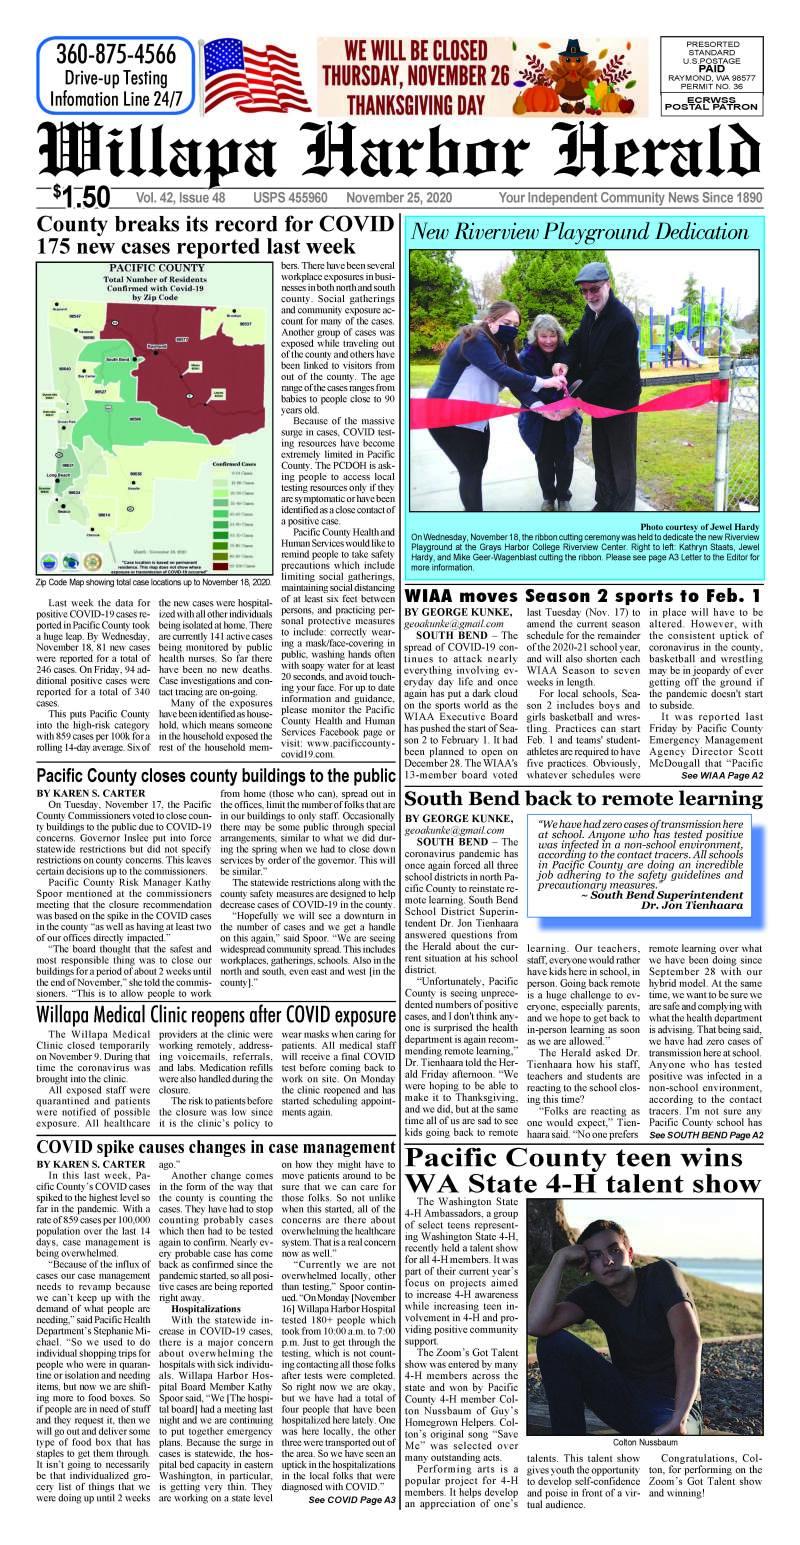 November 25, 2020 Willapa Harbor Herald and Pacific County Press